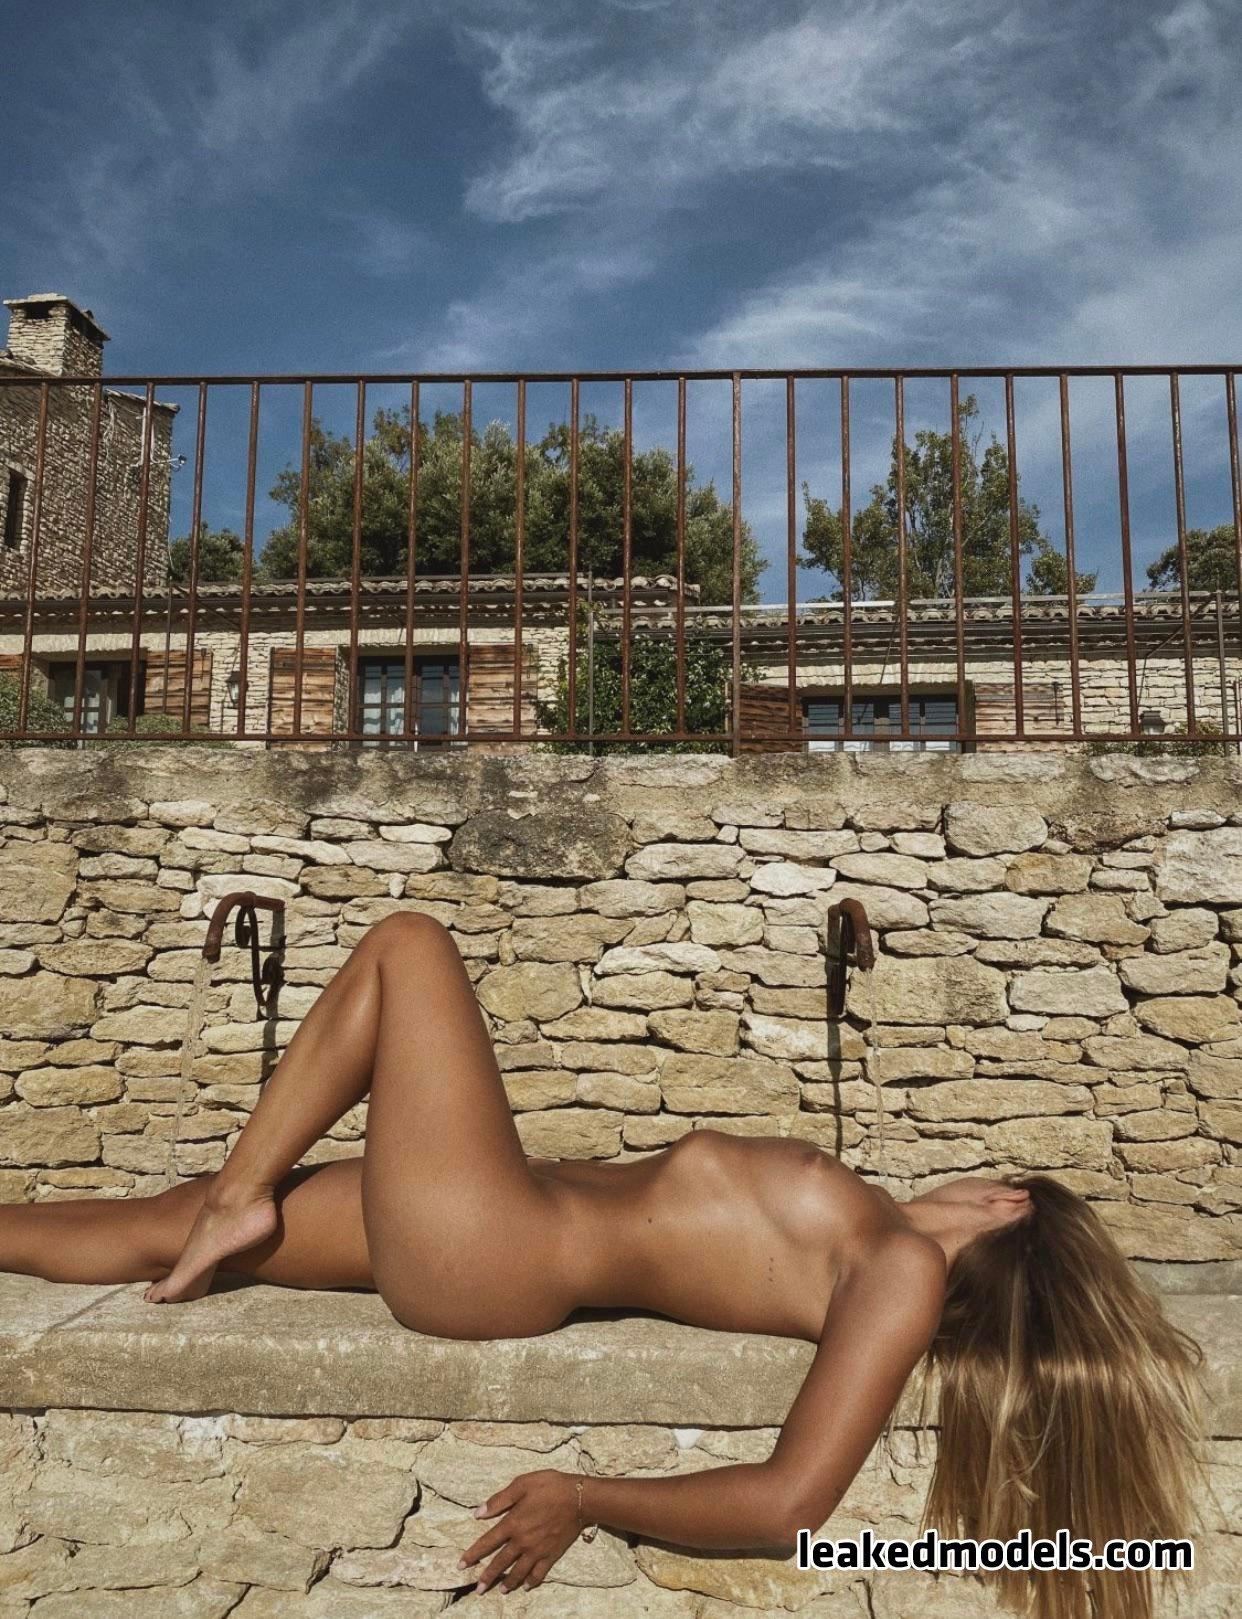 Olivia – Belmooonte Instagram Nude Leaks (33 Photos)